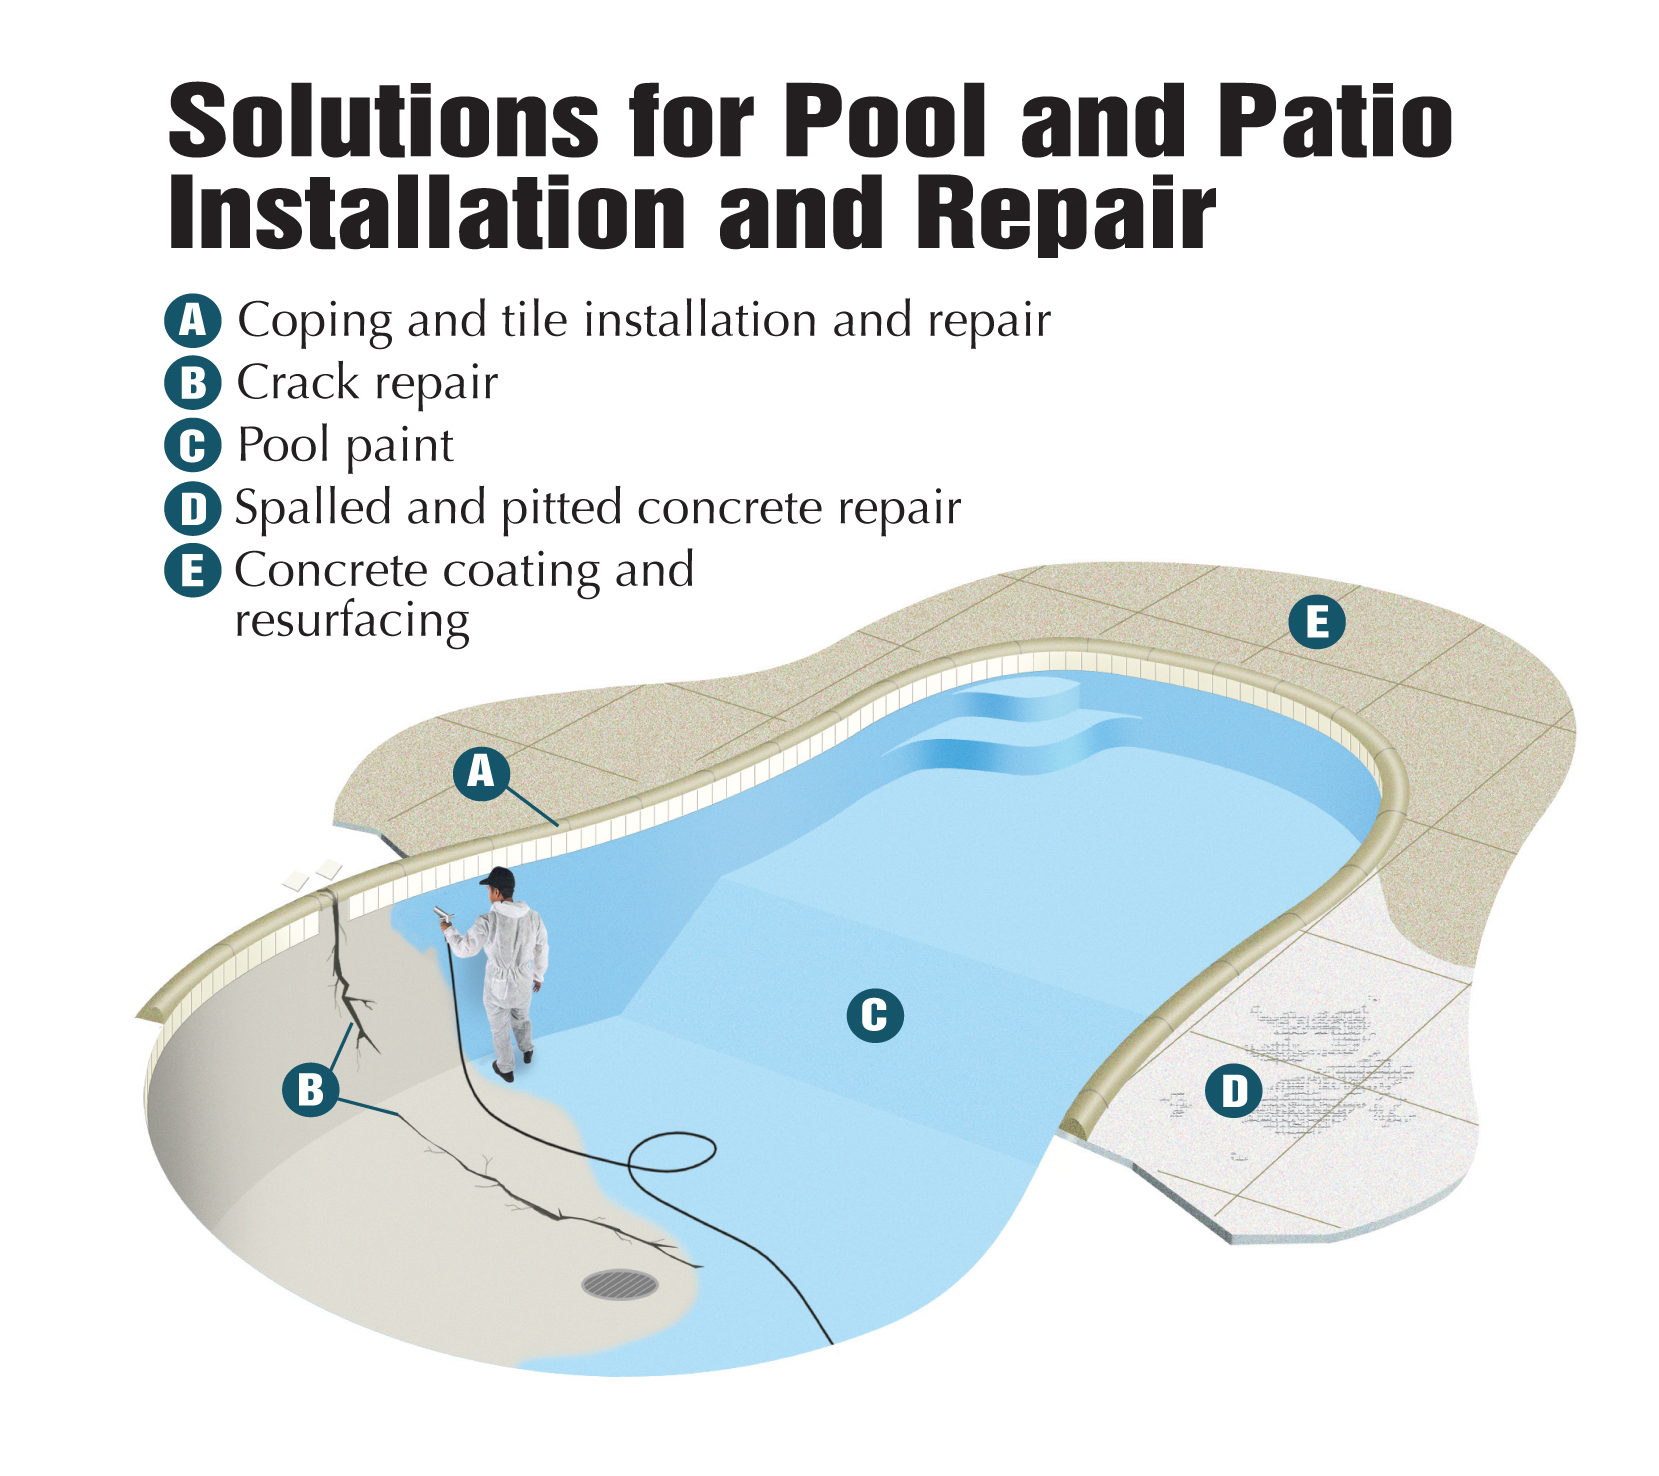 Pool Maintenance | Abatron, Inc.